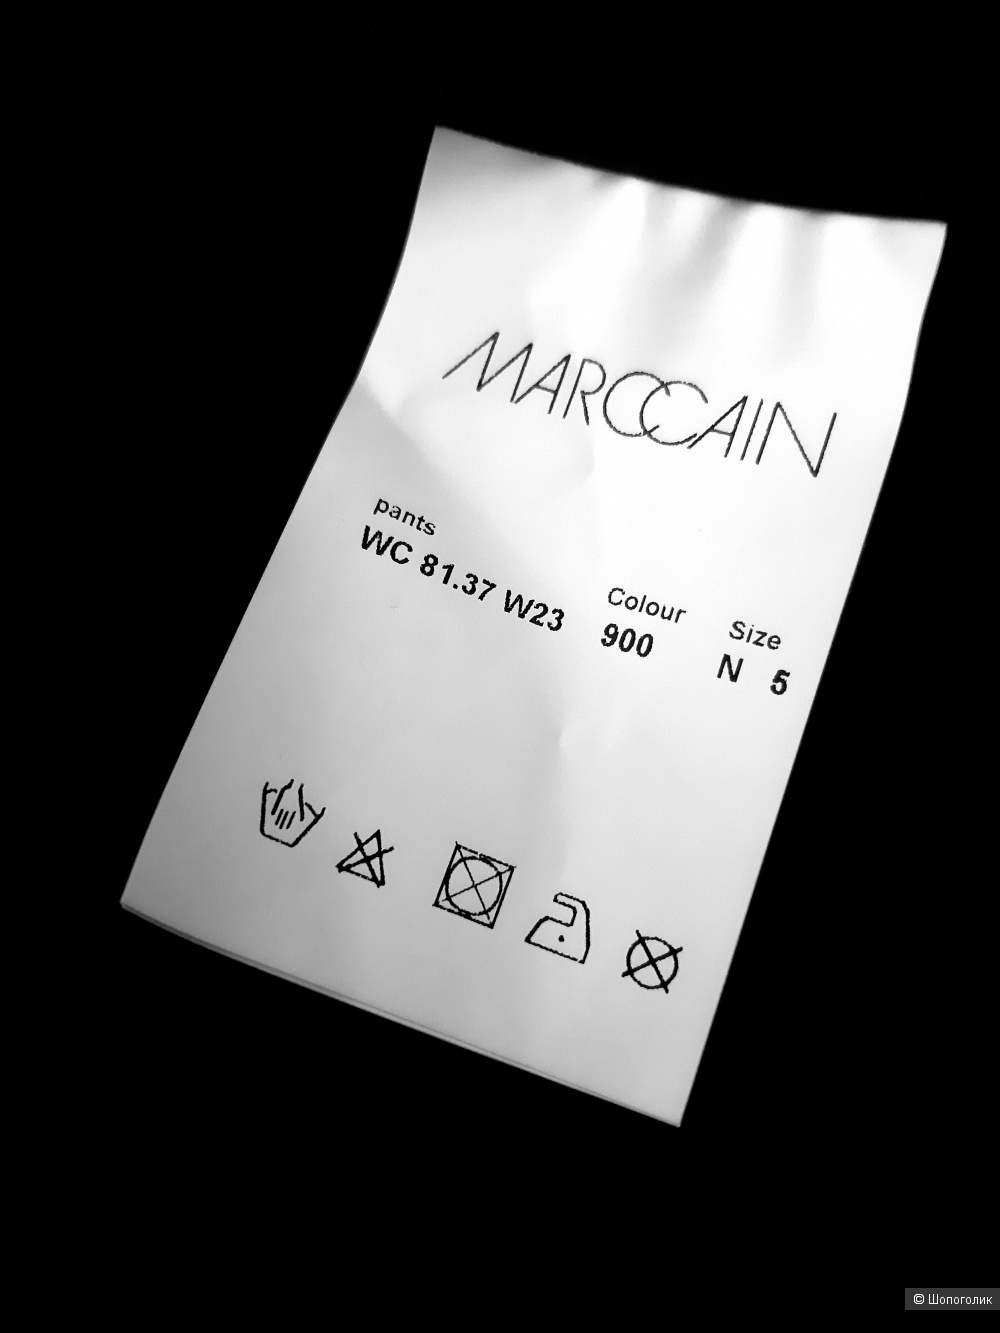 Брюки Marc Cain, размер L/XL